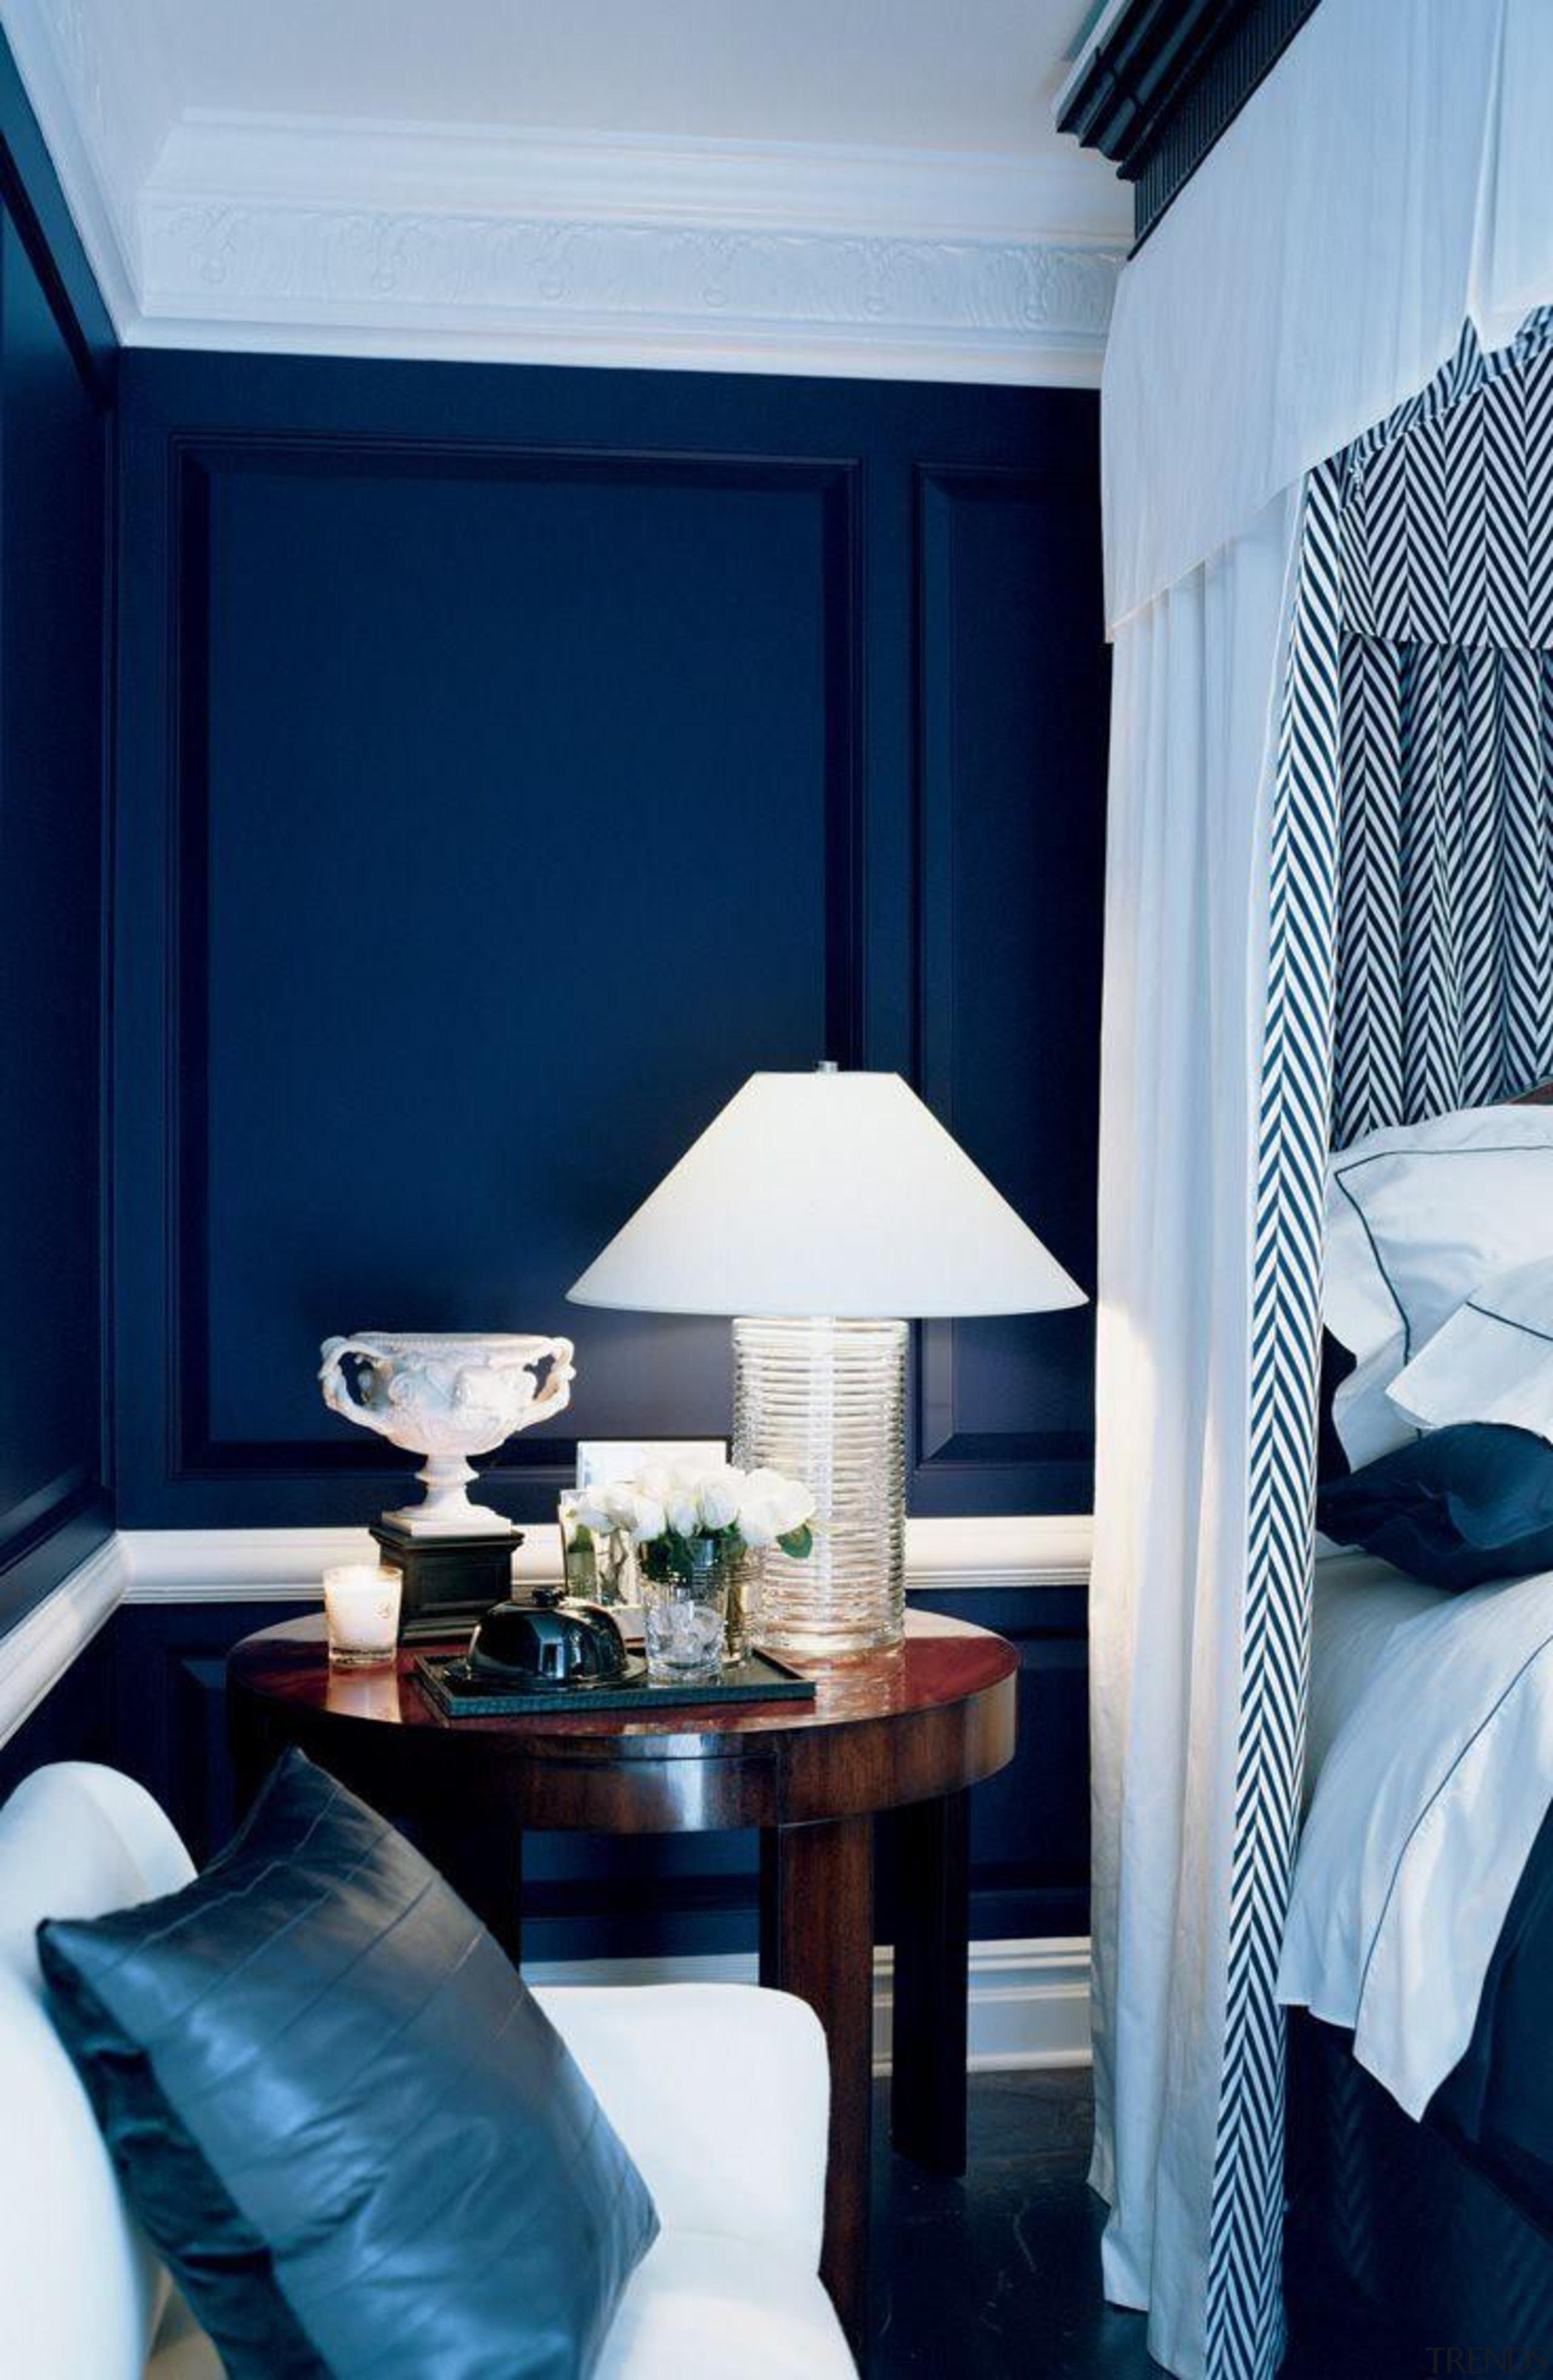 cerulean  homedepotcom.jpg - cerulean__homedepotcom.jpg - blue | blue, ceiling, furniture, home, interior design, room, suite, window, blue